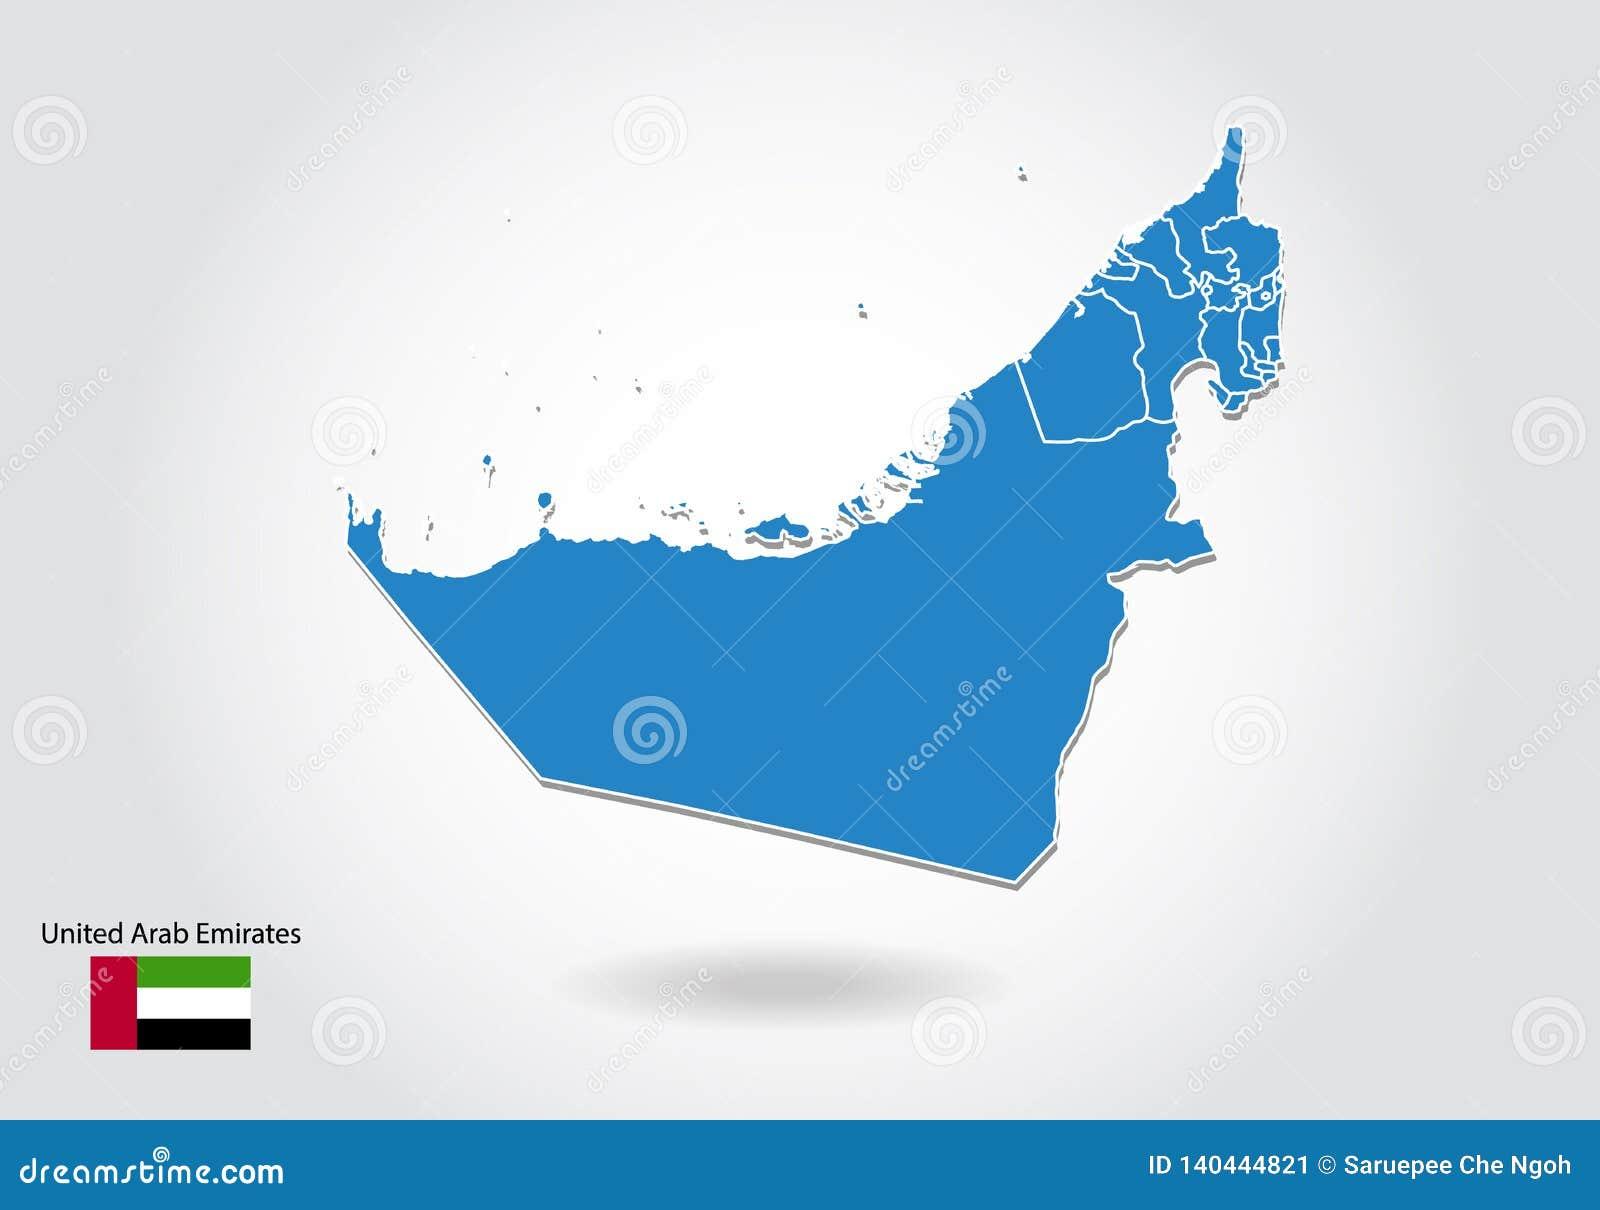 United Arab Emirates Map Design With 3D Style. Blue UAE Map ... on dubai map, persian gulf, uae map, bahamas map, tunisia map, ras al-khaimah, bangladesh map, burj al-arab, middle east, oman map, iran map, great britain map, saudi arabia map, yemen map, bahrain map, india map, saudi arabia, hong kong map, burj khalifa, sharjah map, finland map, arabian peninsula, gibraltar map, mali map, abu dhabi, niue map, dubai international airport, states of america map, syria map,